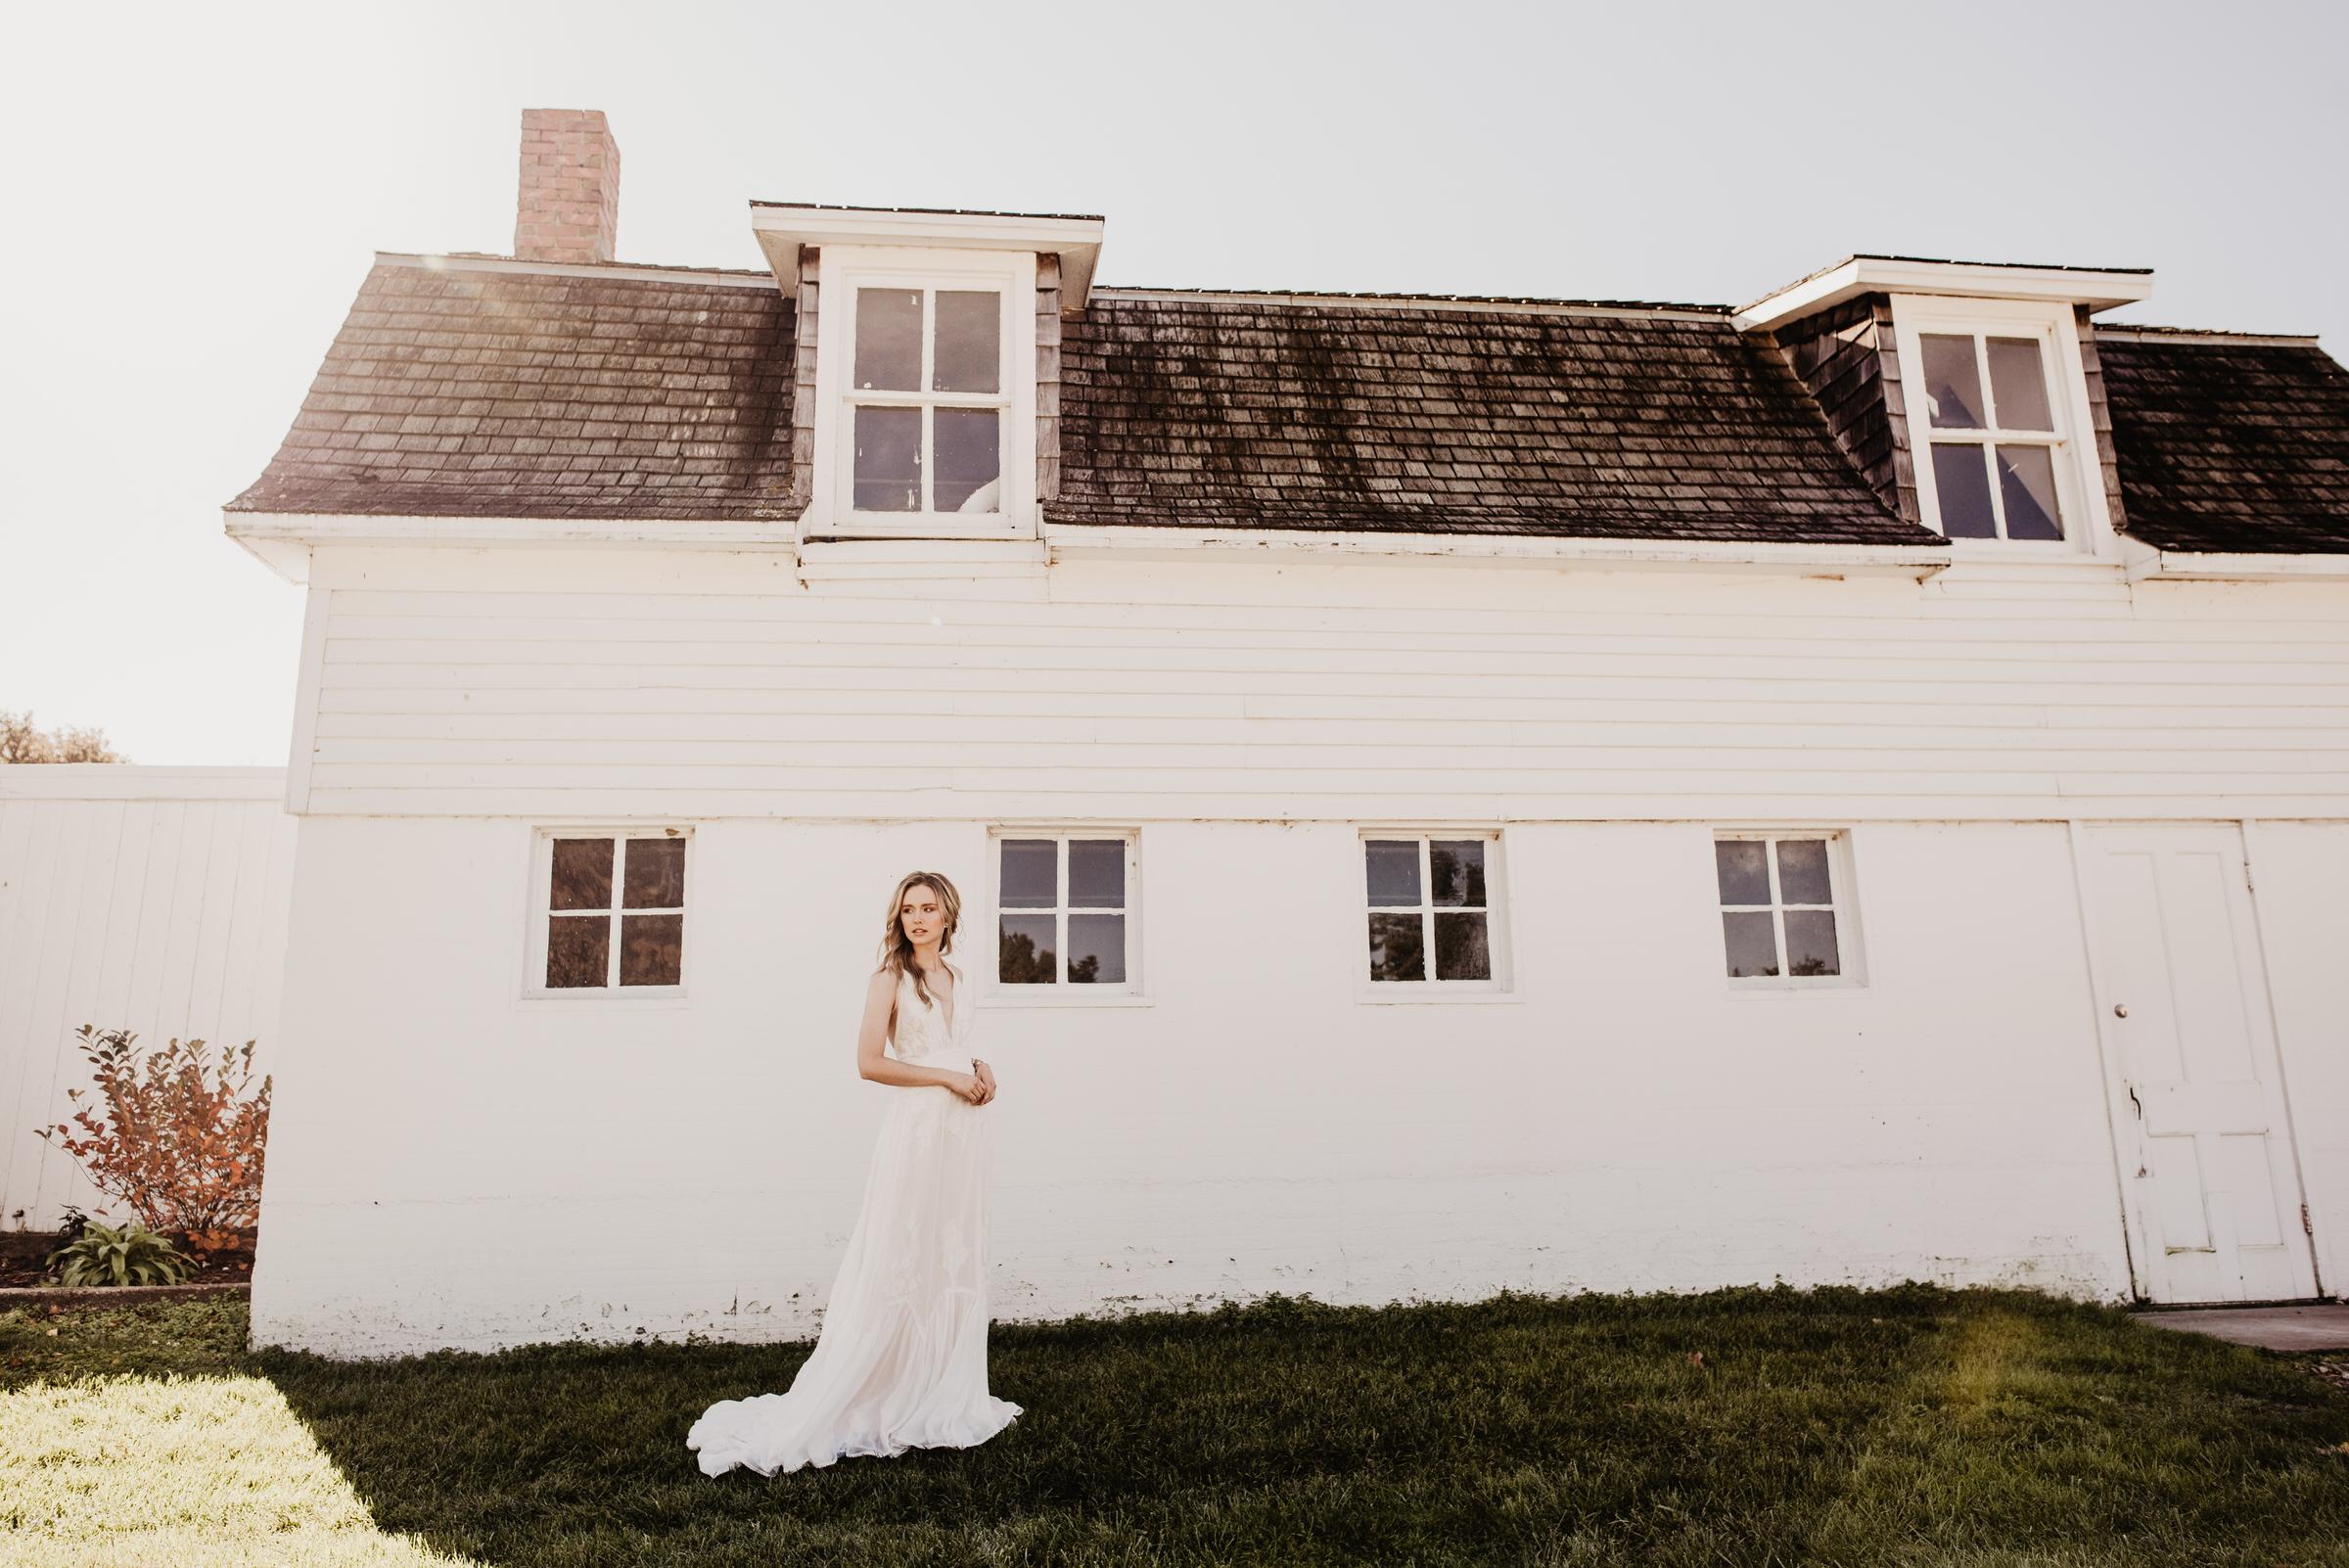 Kaylie-Sirek-Photography-NWD-SS19-02.jpg